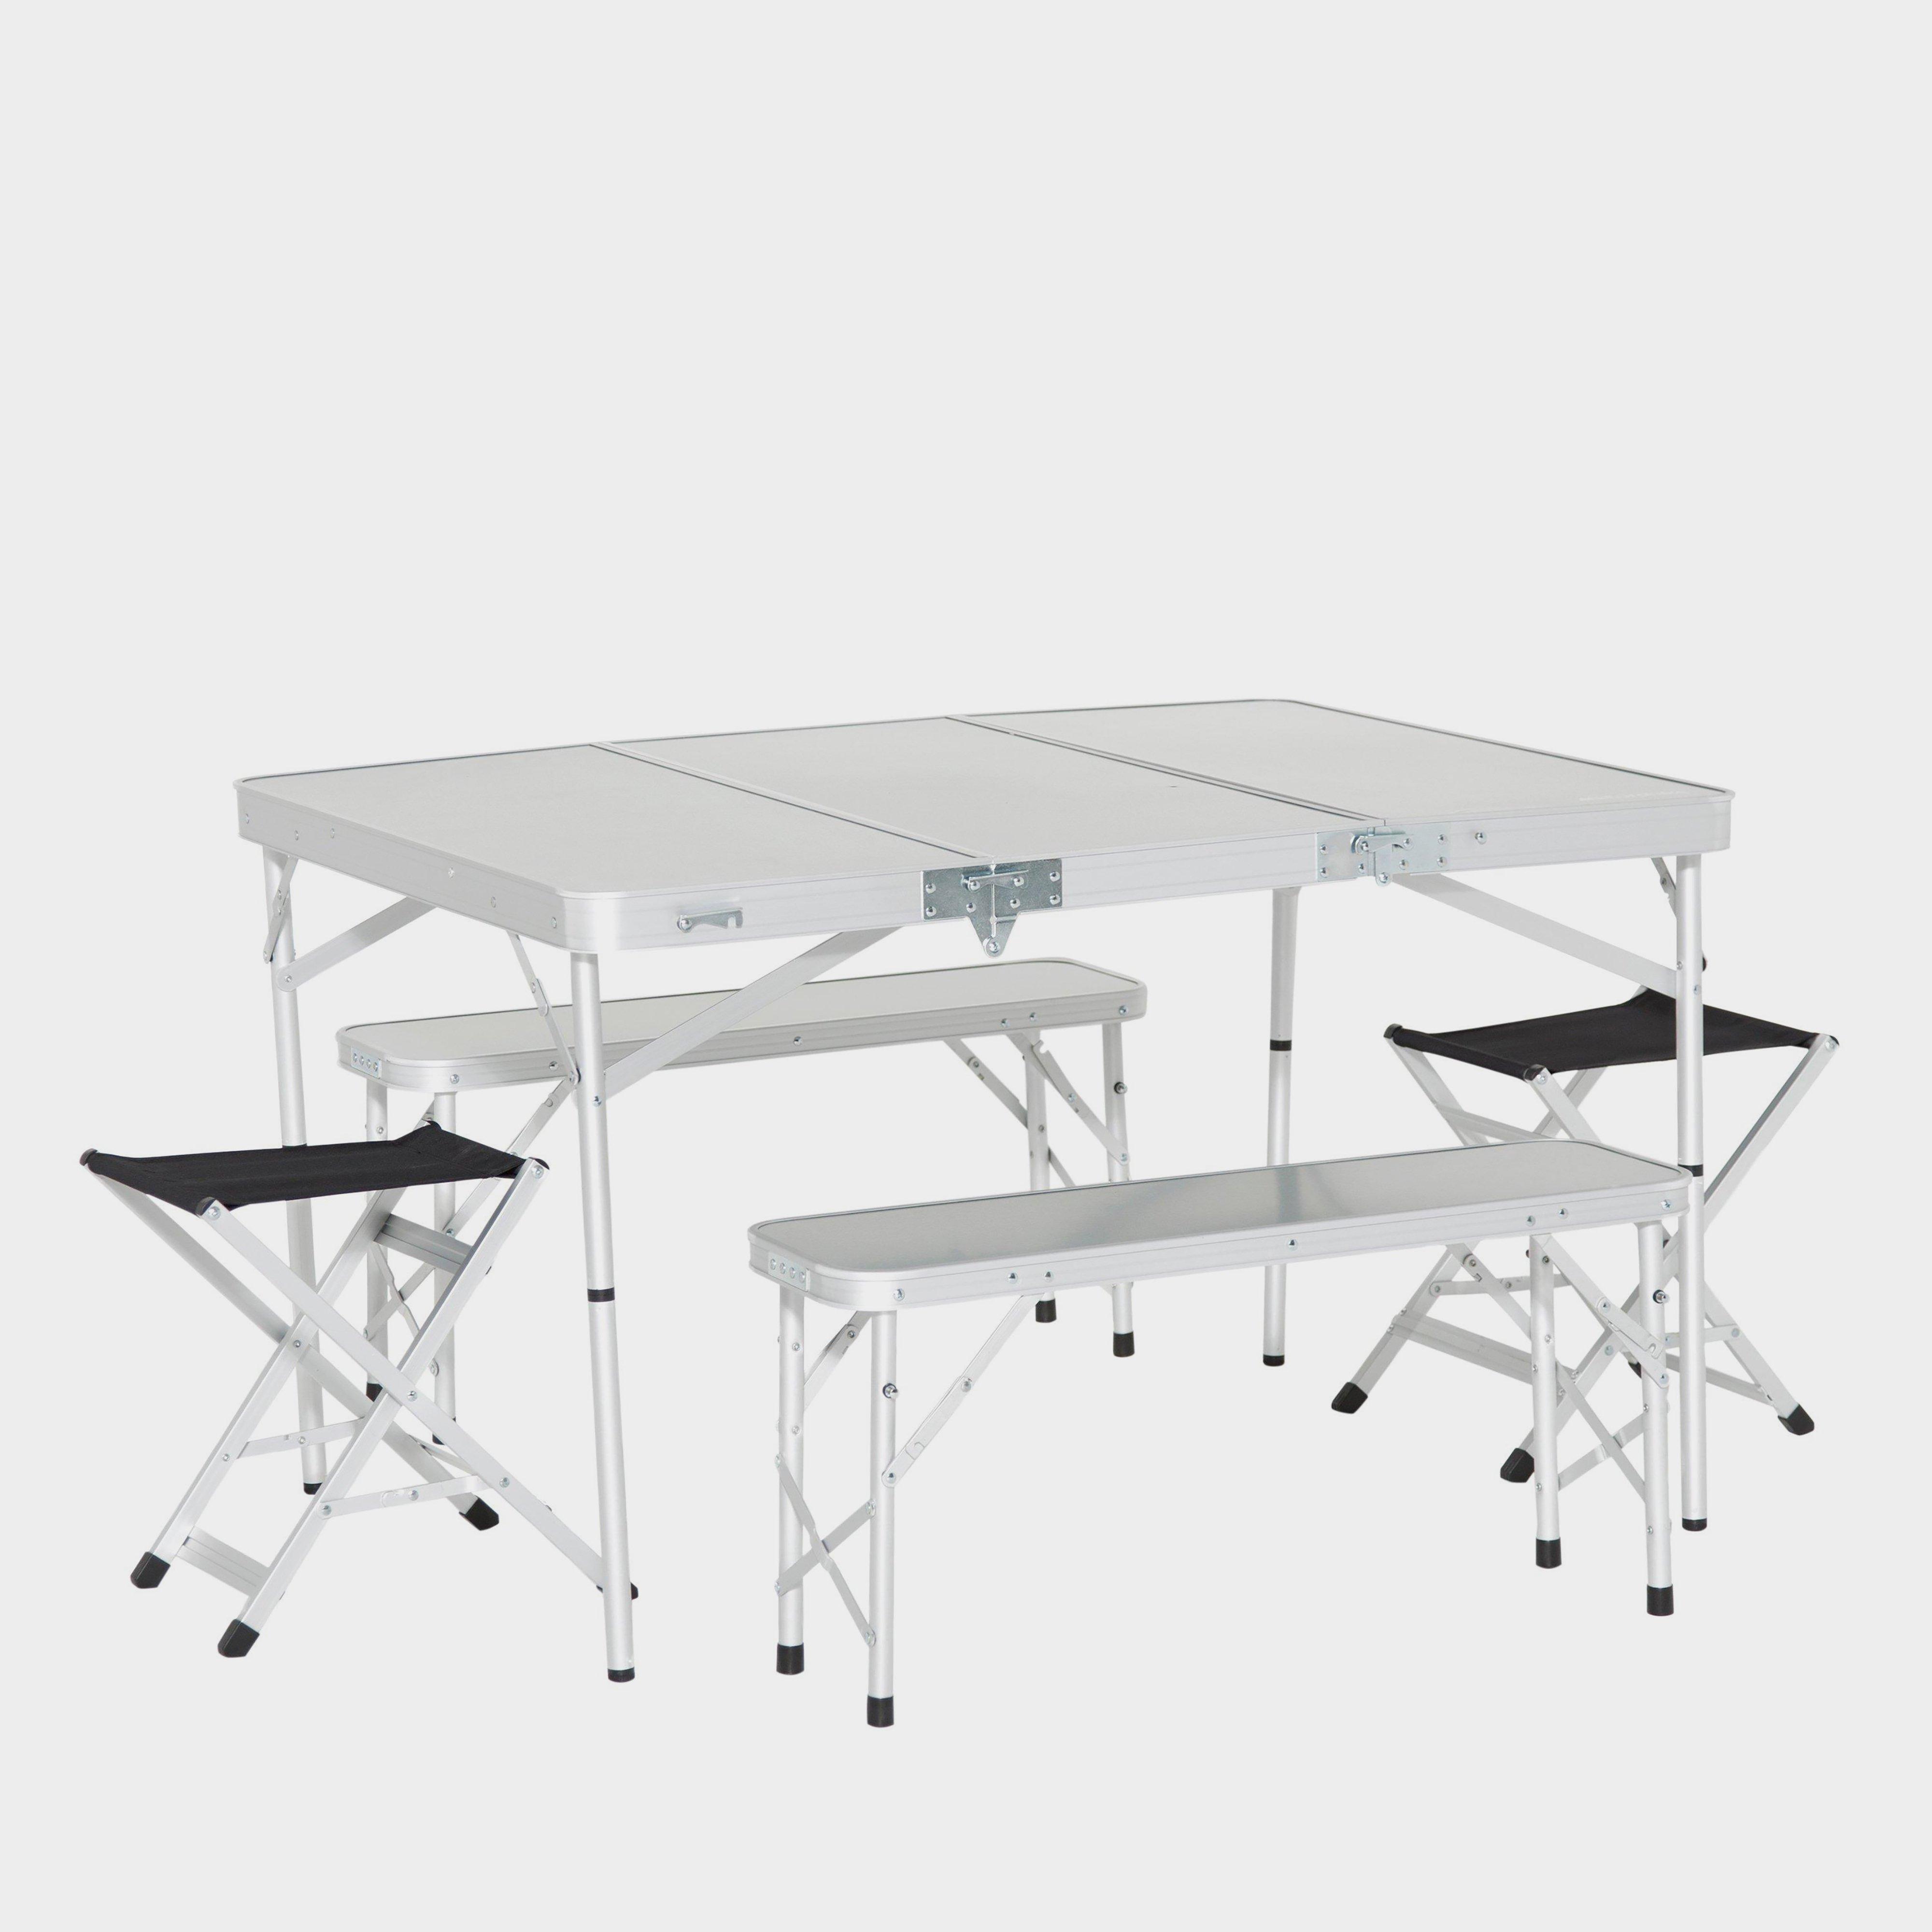 New Eurohike Family Picnic Table Set Camping Furniture | eBay